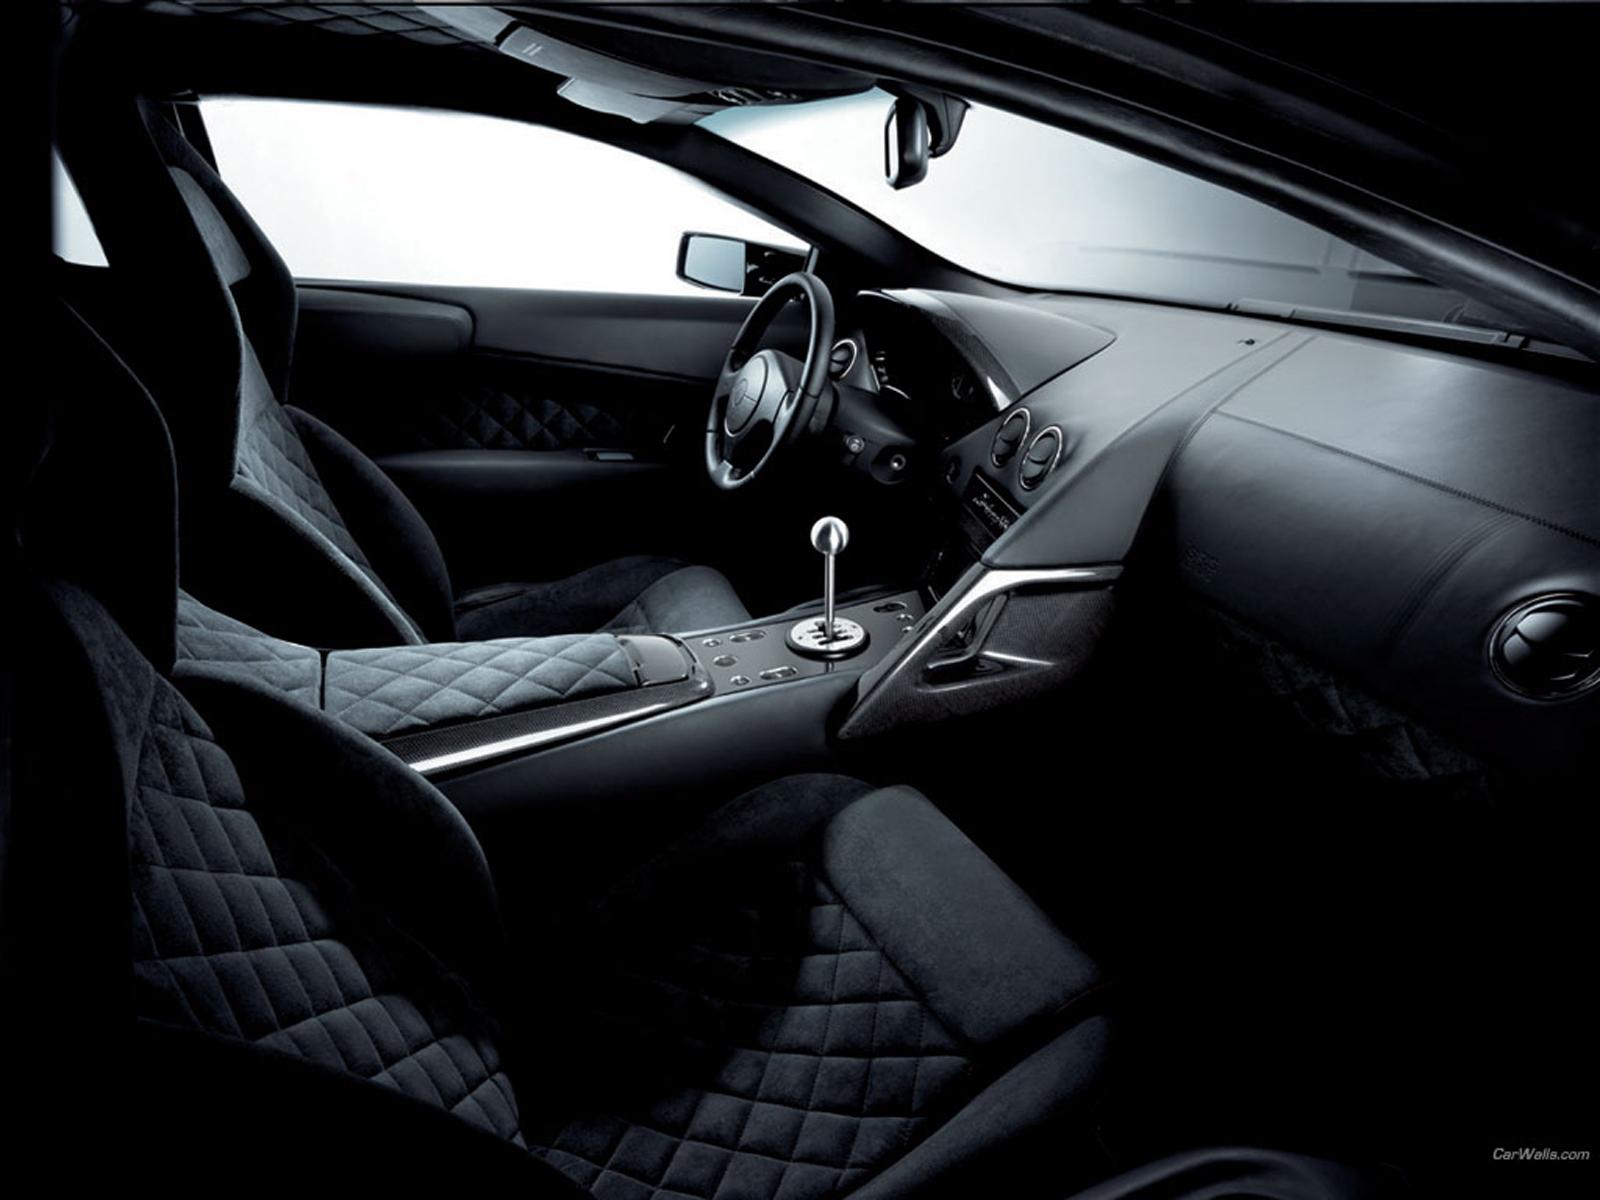 Lamborghini Murcielago Hd Wallpapers And Inside View Hd Car Wallpapers